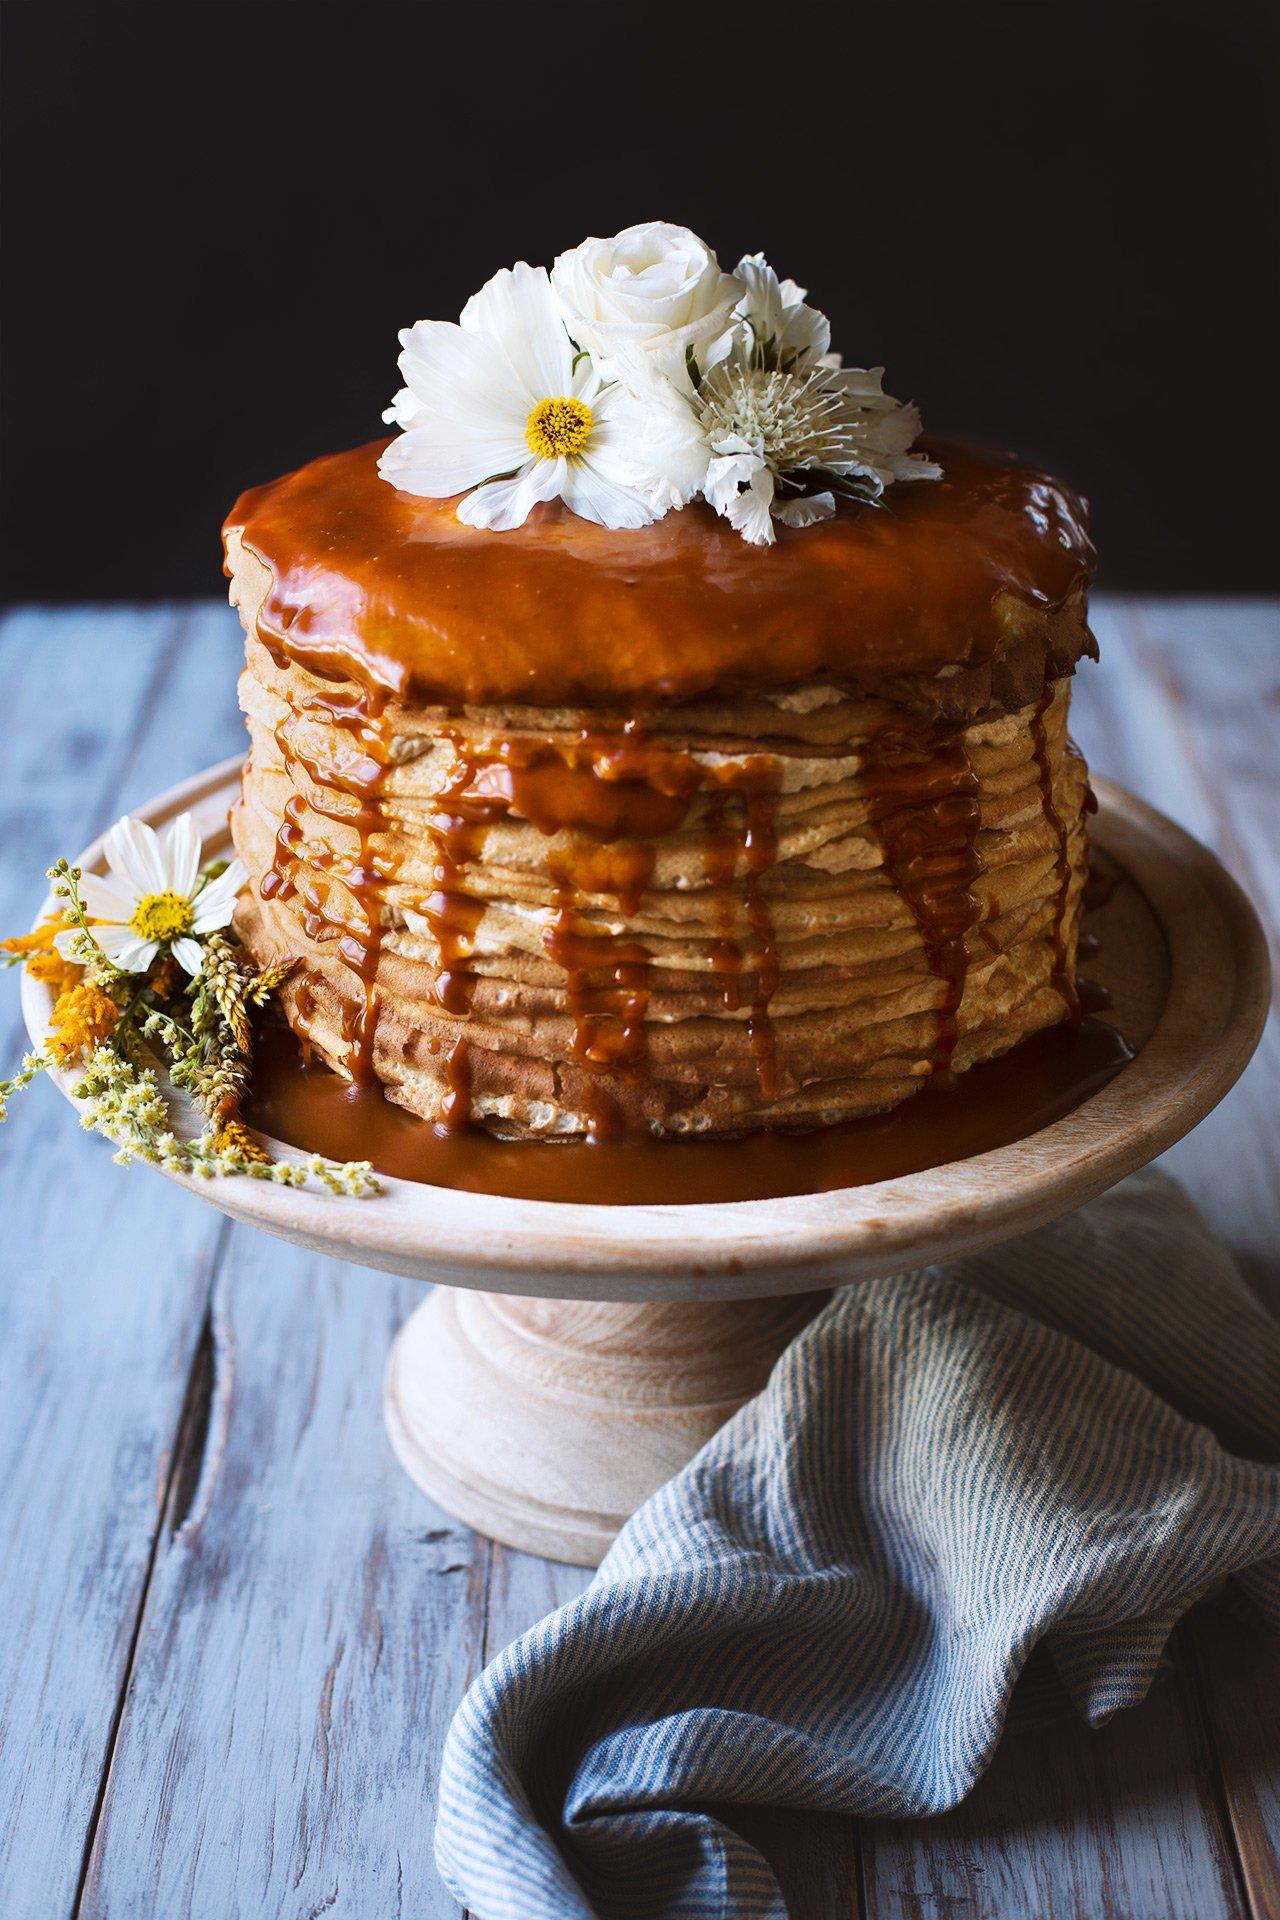 dulce-de_-leche_-crepe_-cake_-2345-1